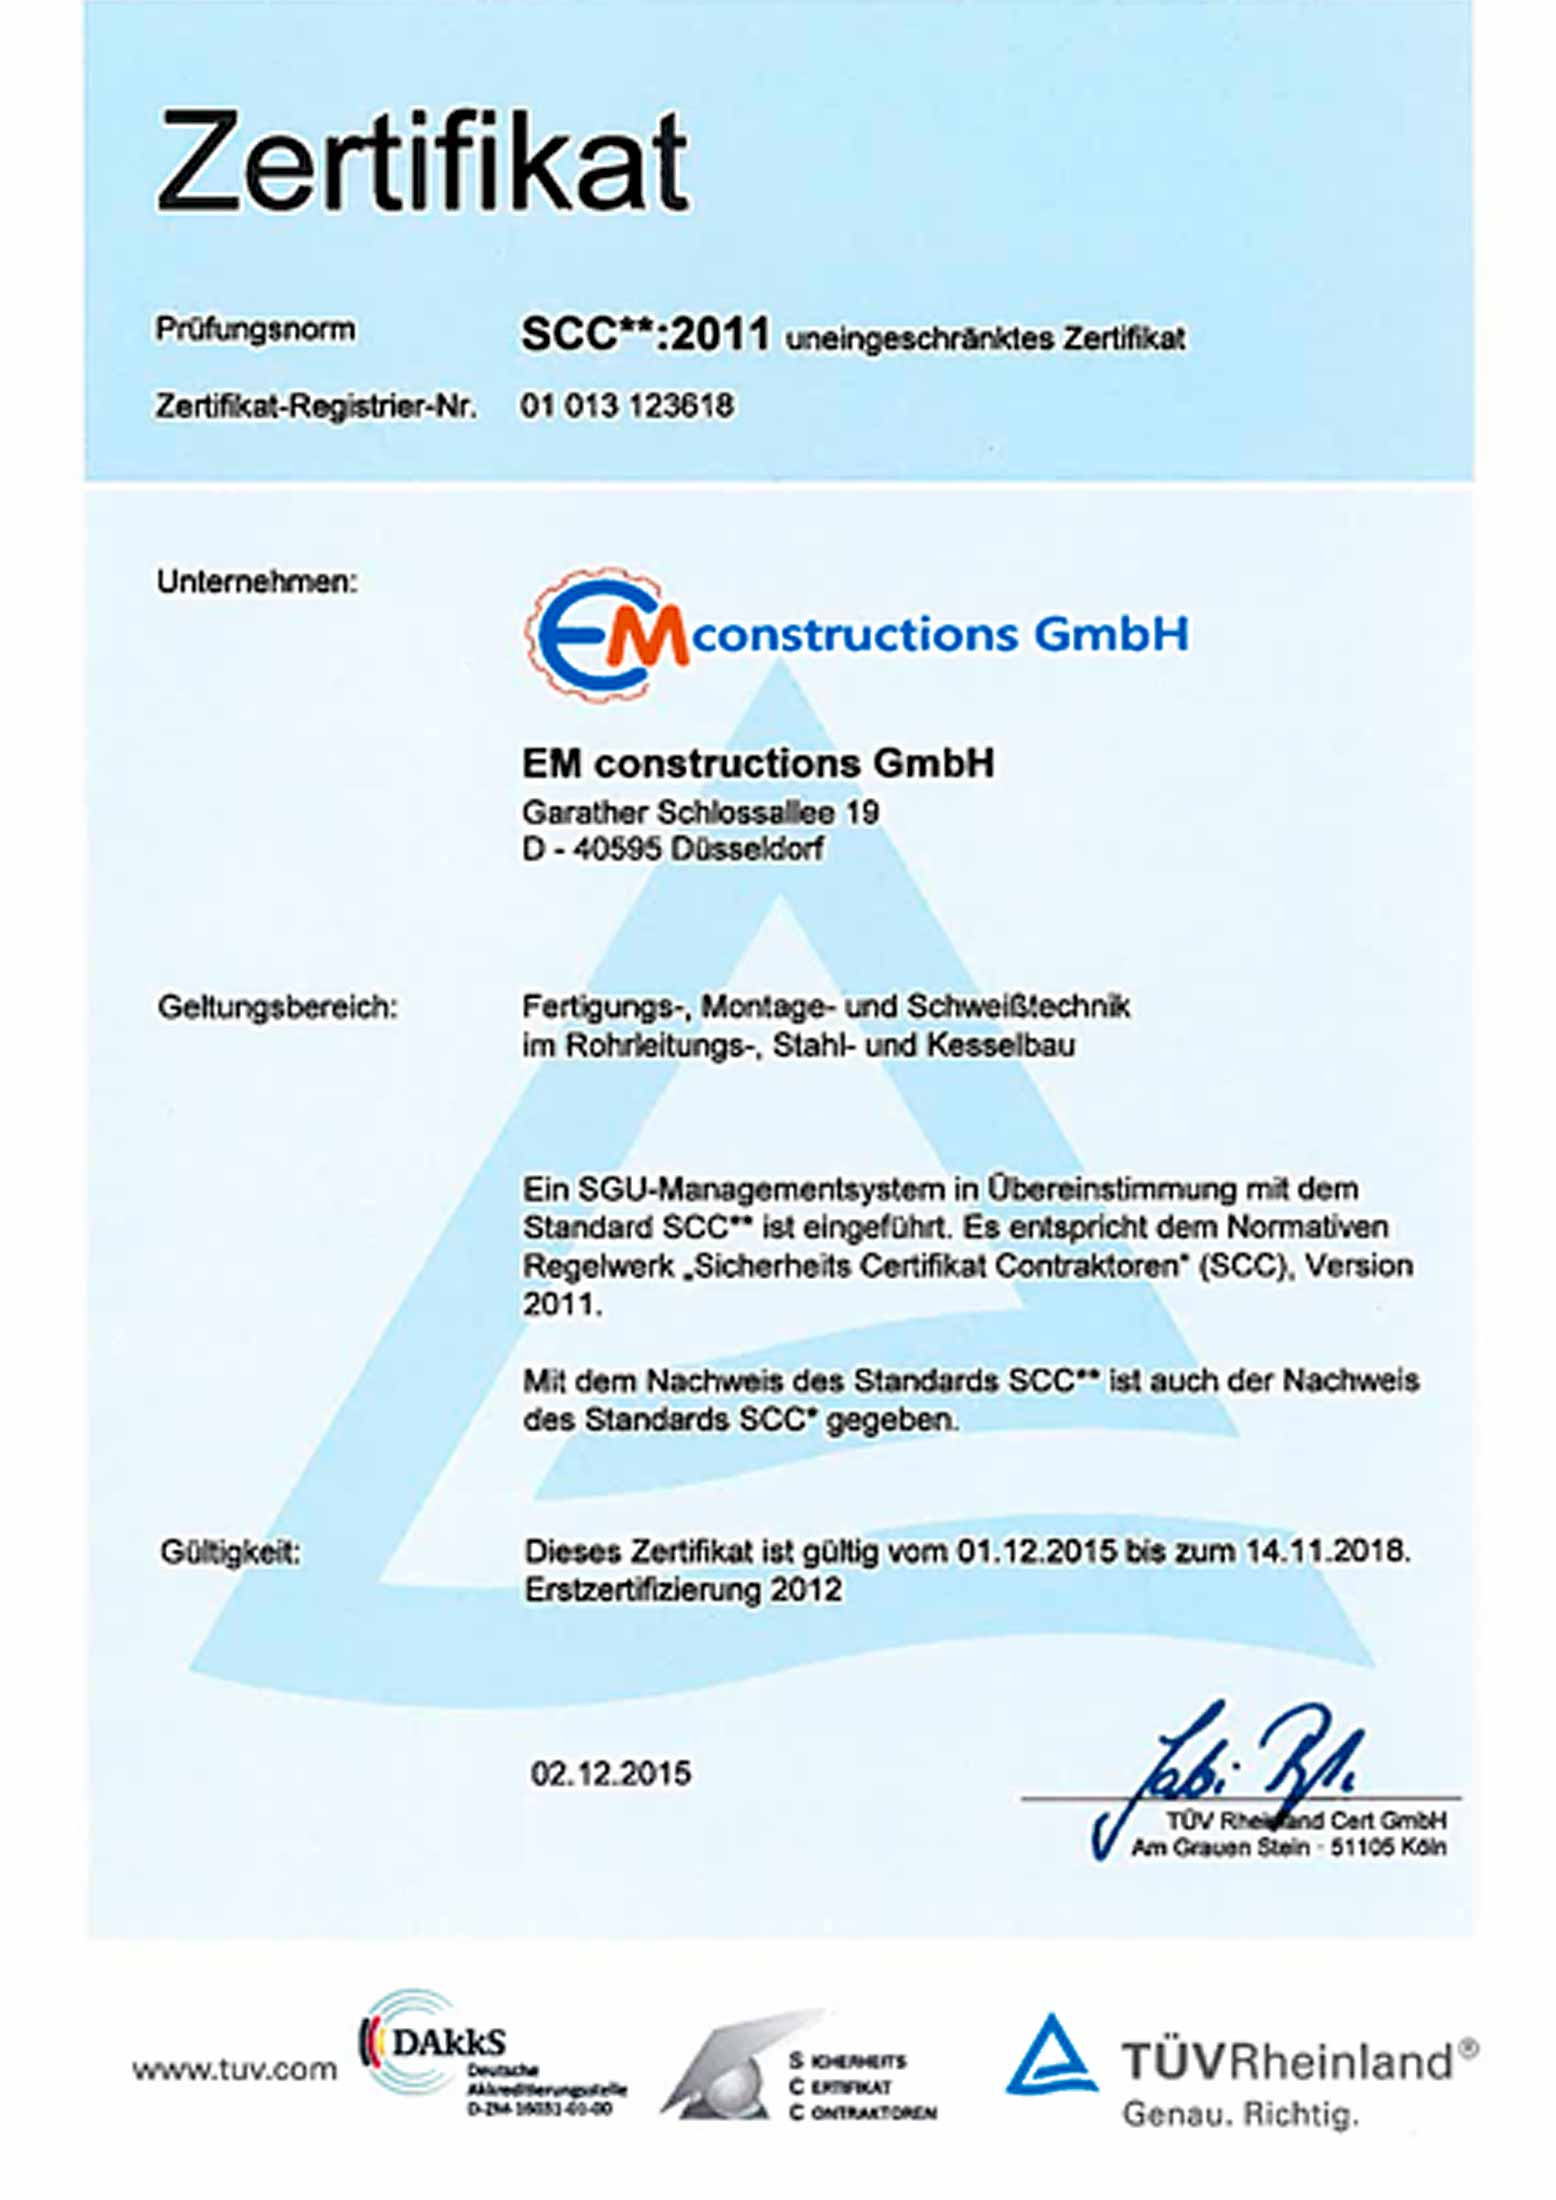 EM Constructions GmbH - Unternehmen